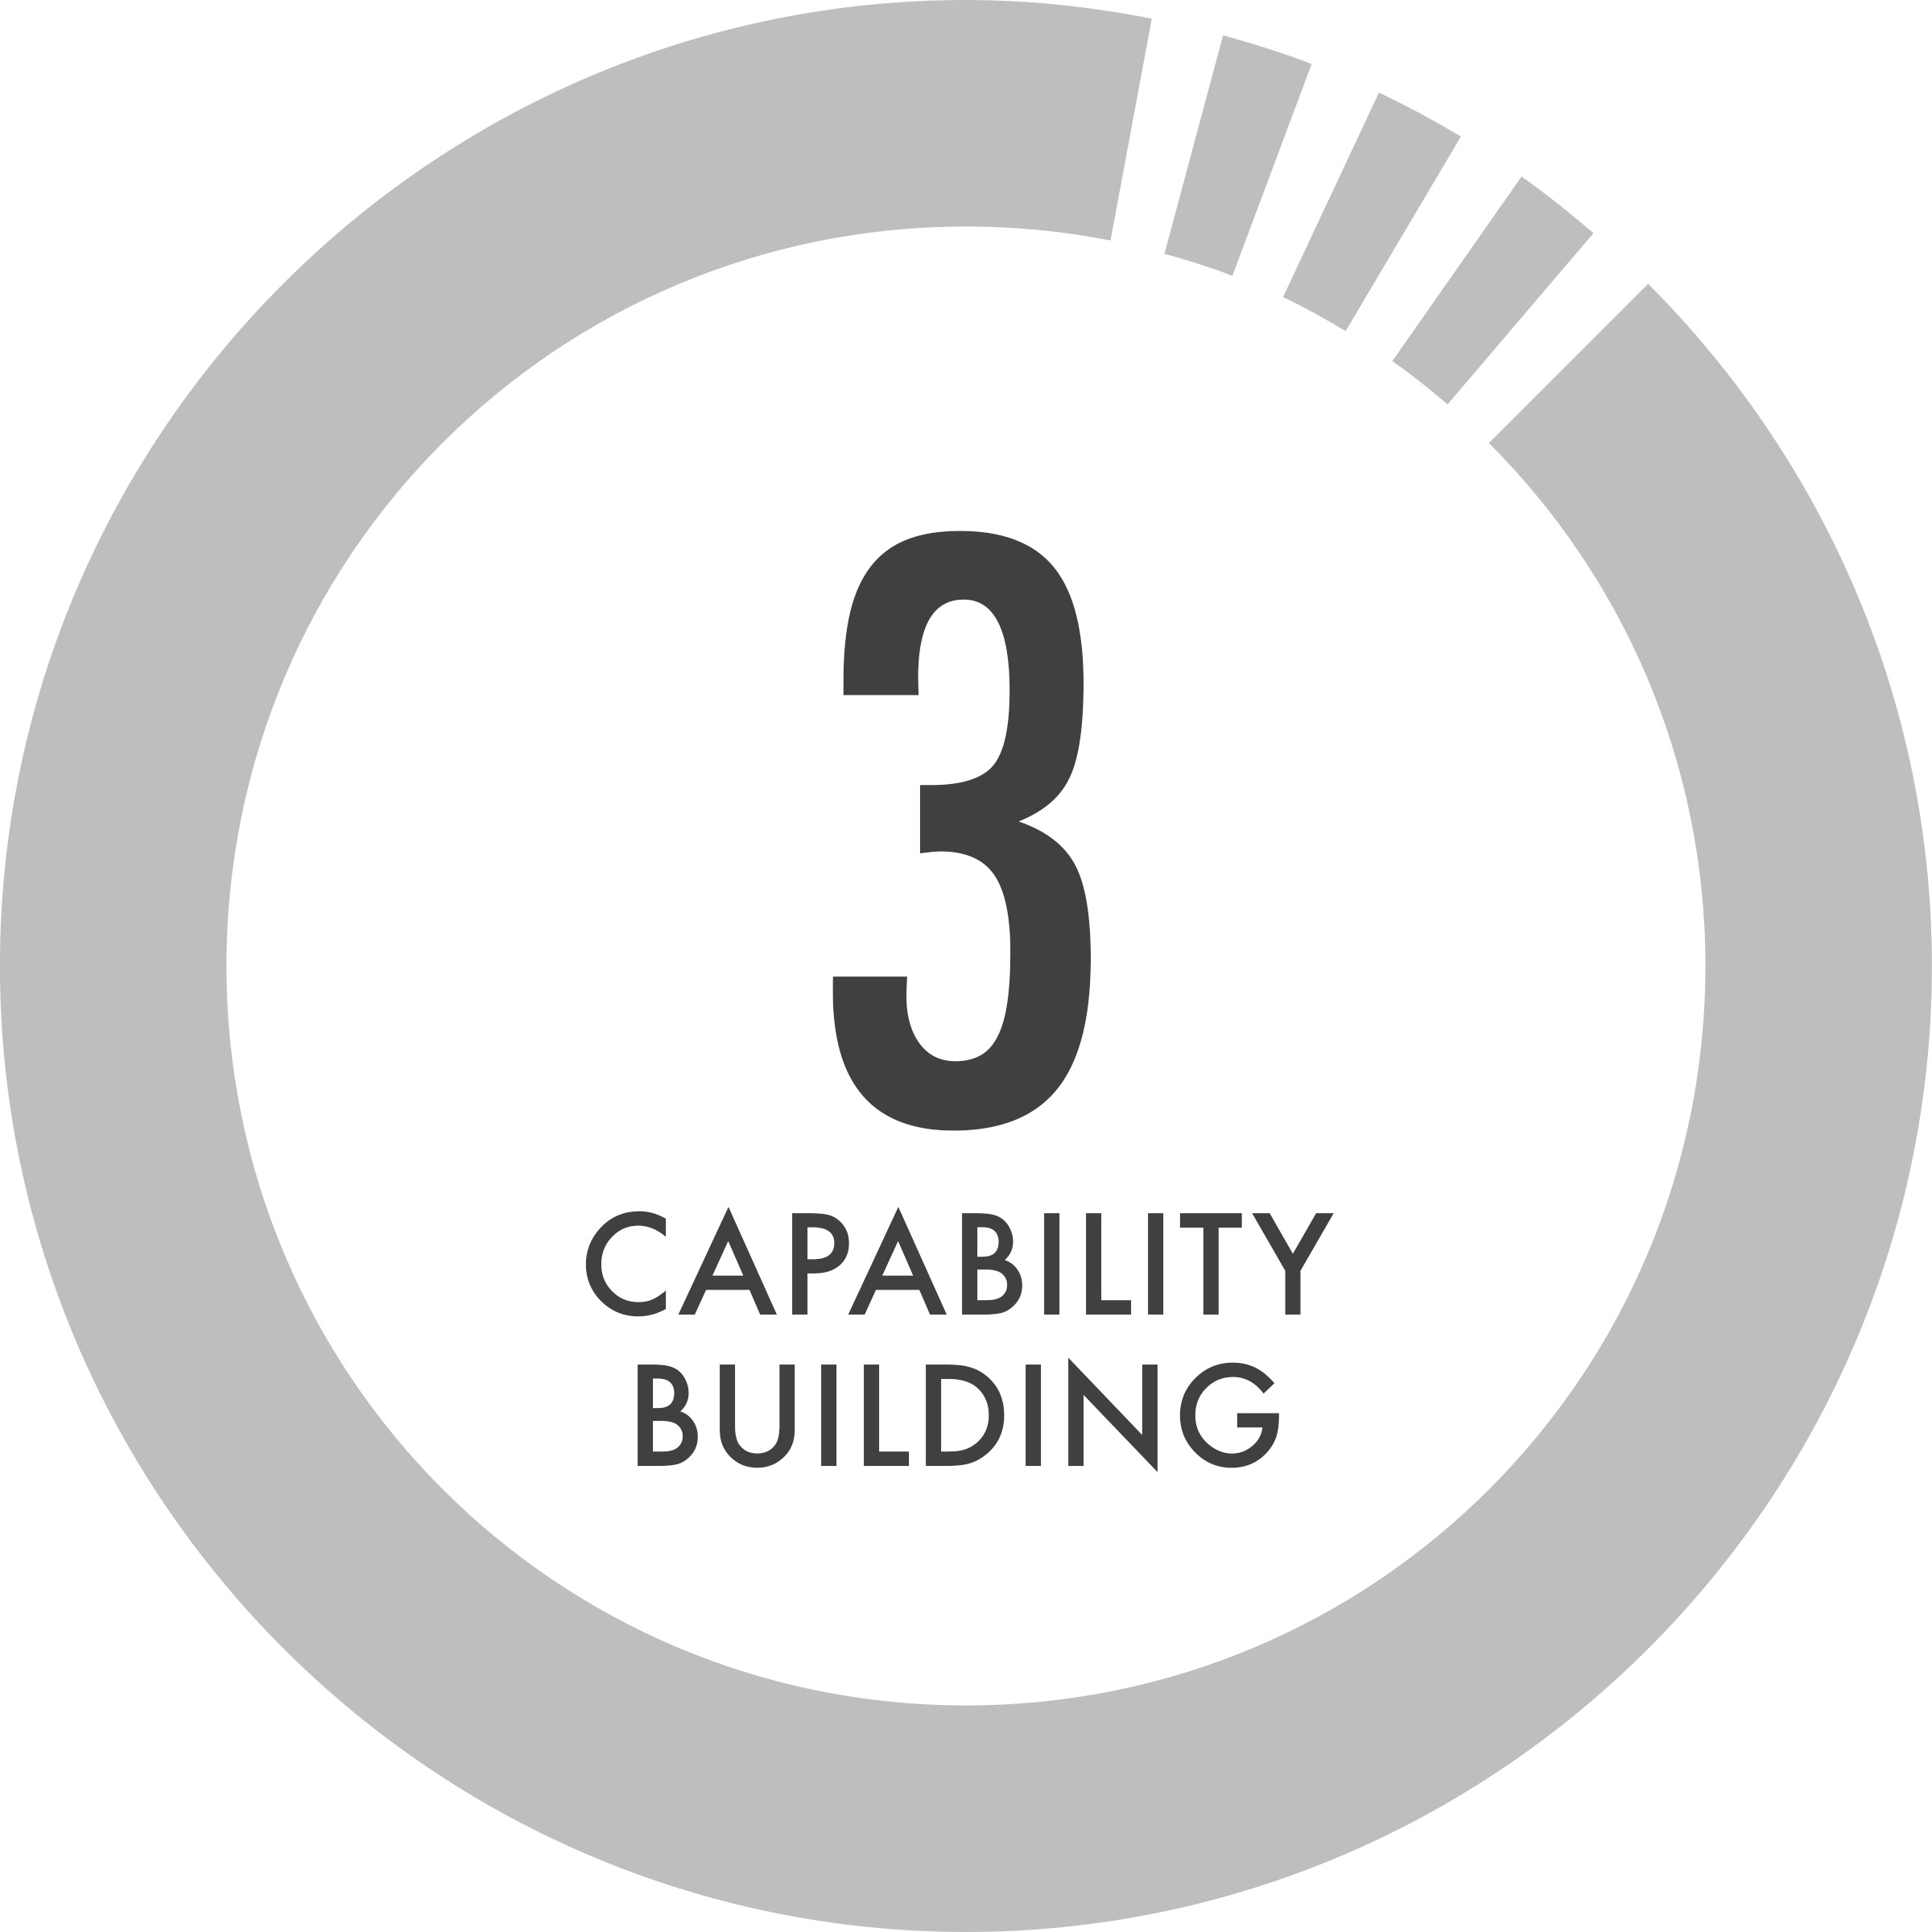 Capability Building - Circle 3.jpg